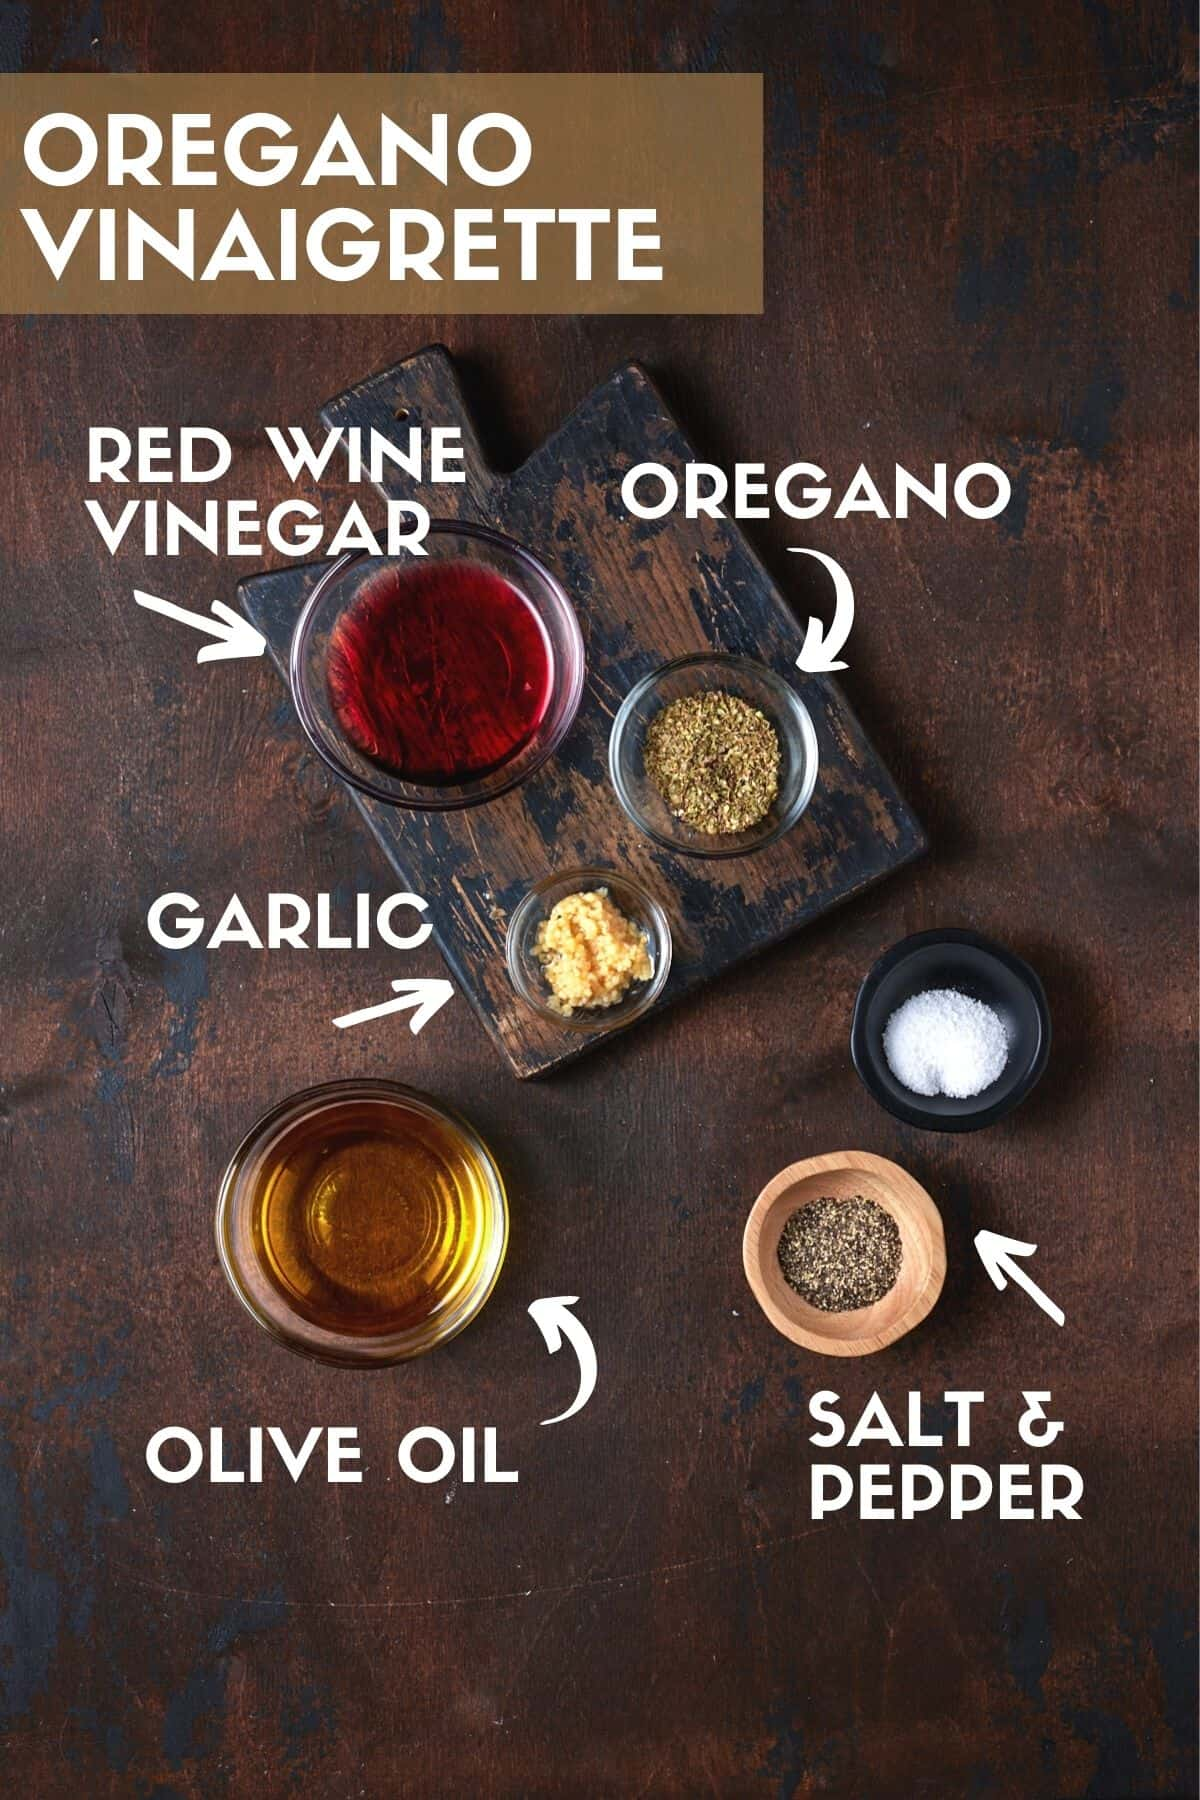 Oregano vinaigrette ingredients for chickpea salad.